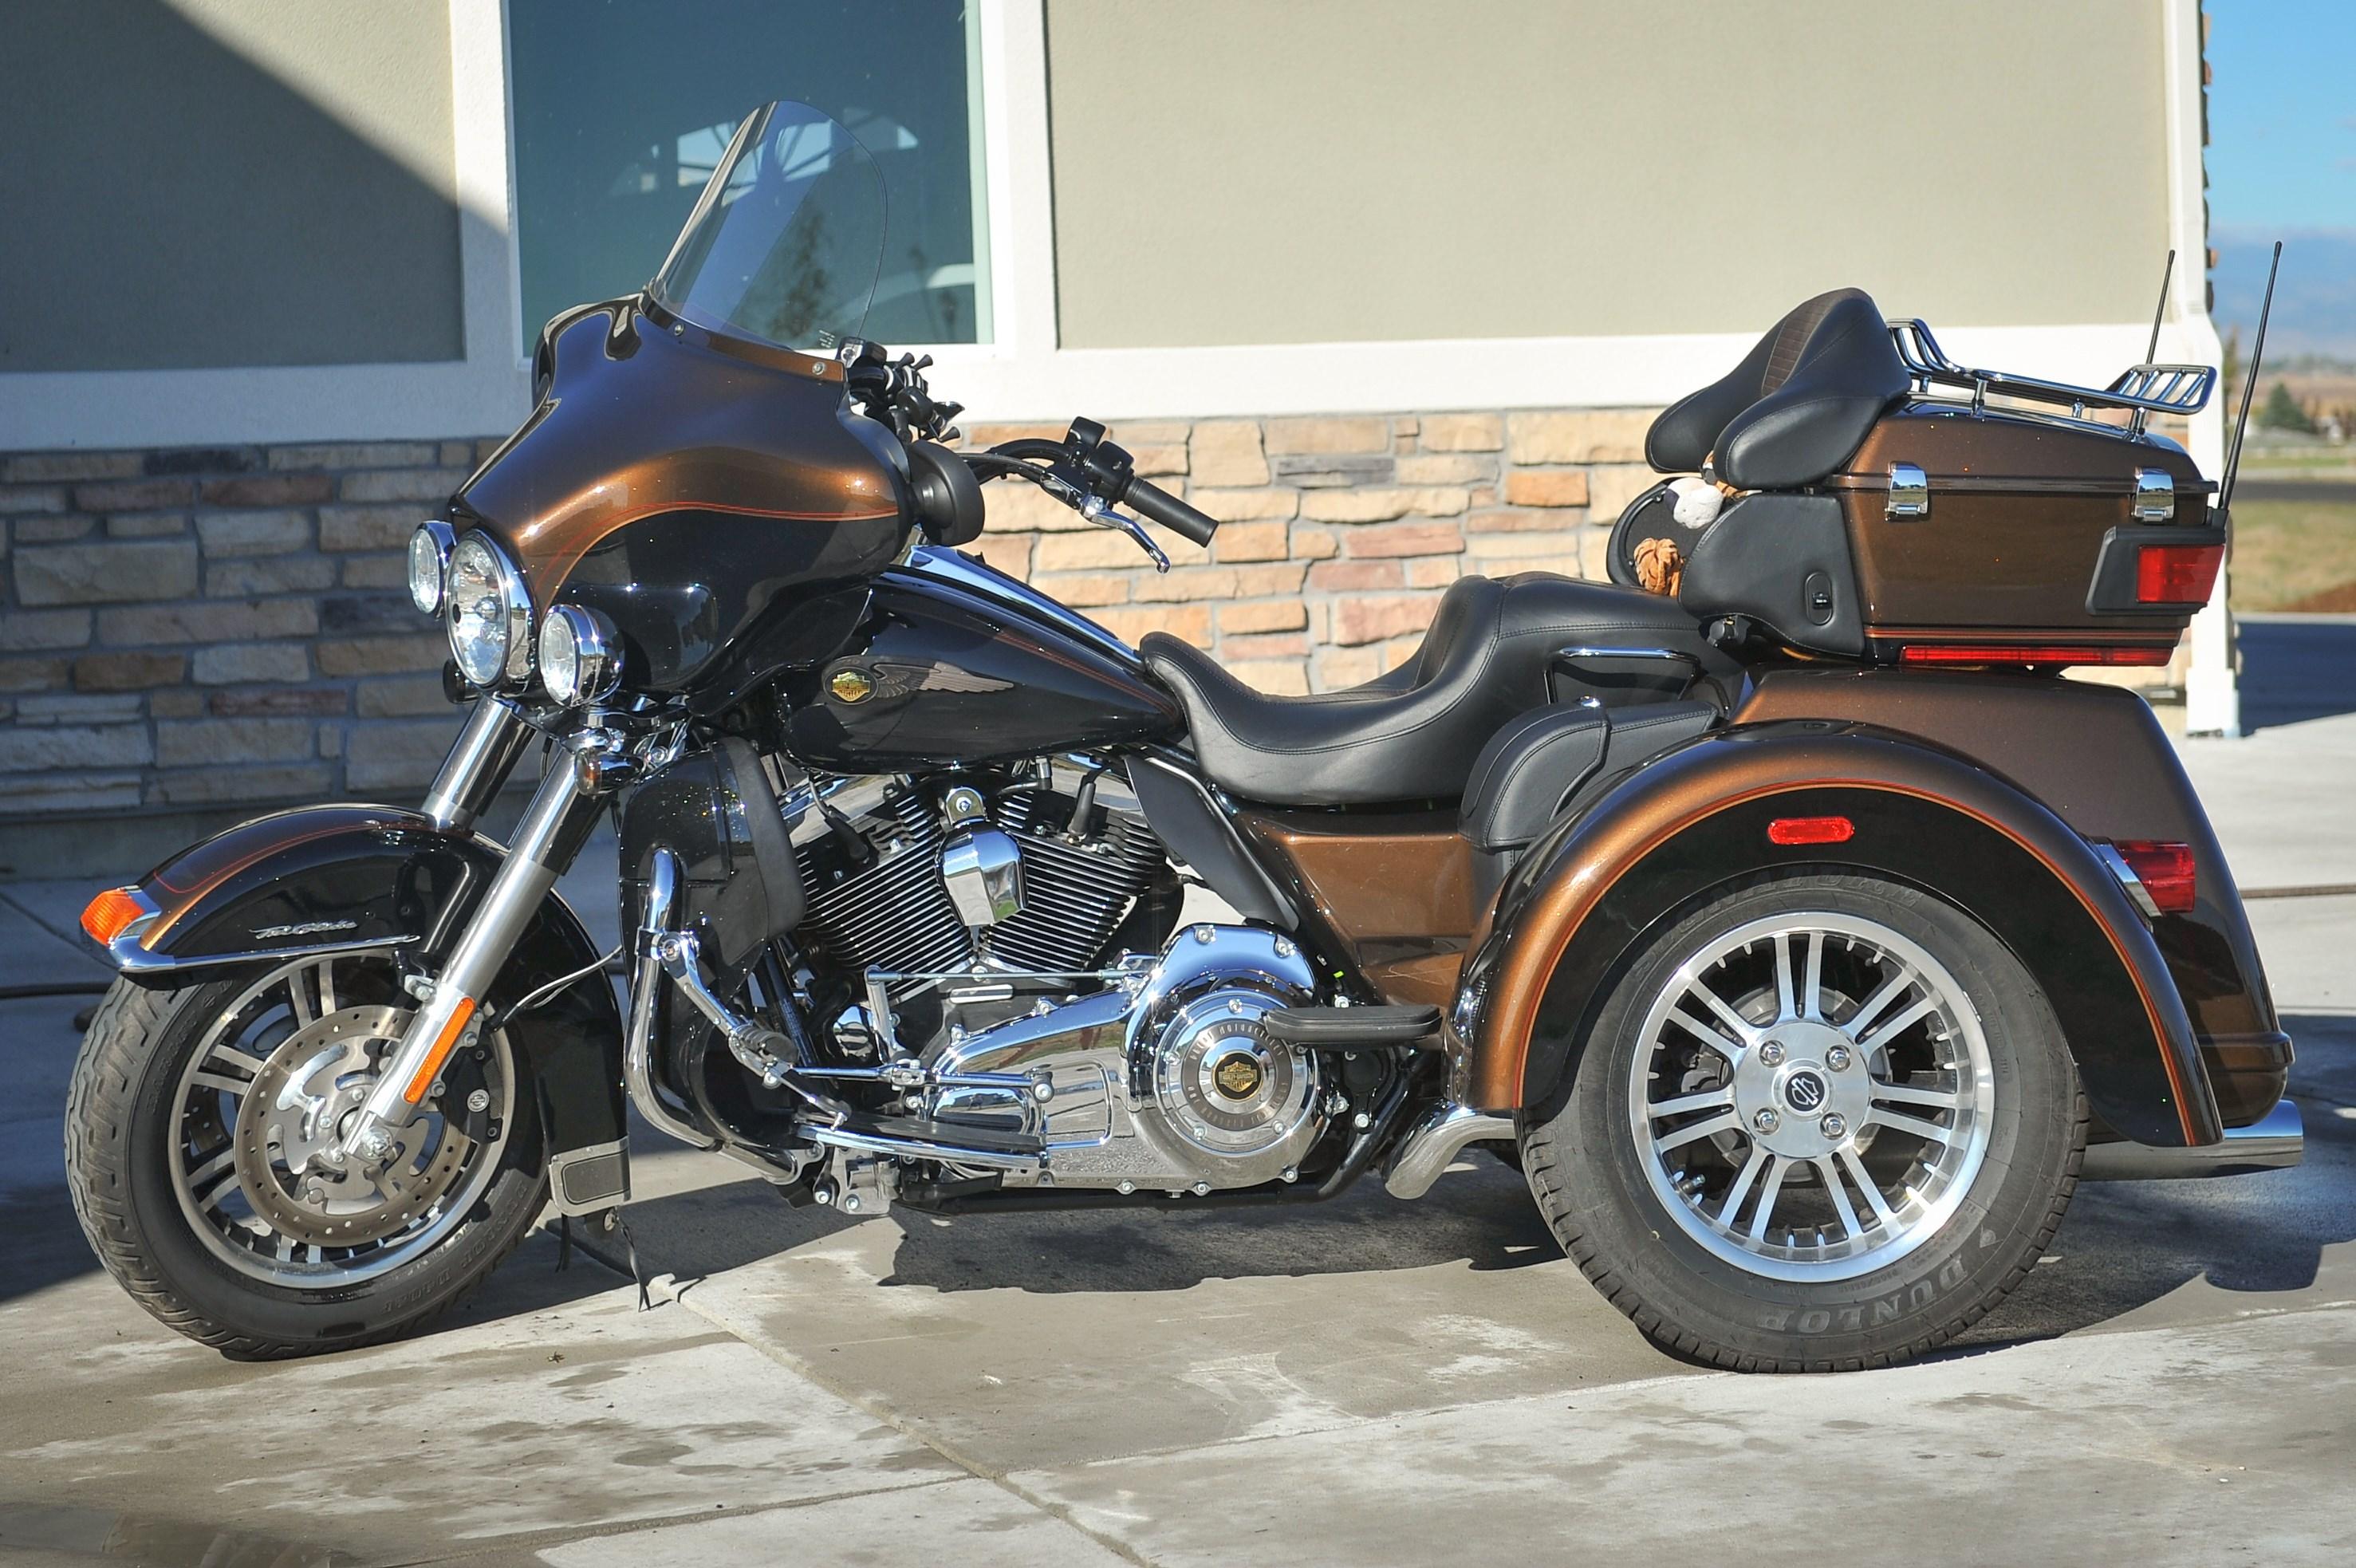 2013 Harley Davidson Flhtcutg Tri Glide Ultra Classic Review: 2013 Harley-Davidson® FLHTCUTAE Tri Glide™ Ultra Classic